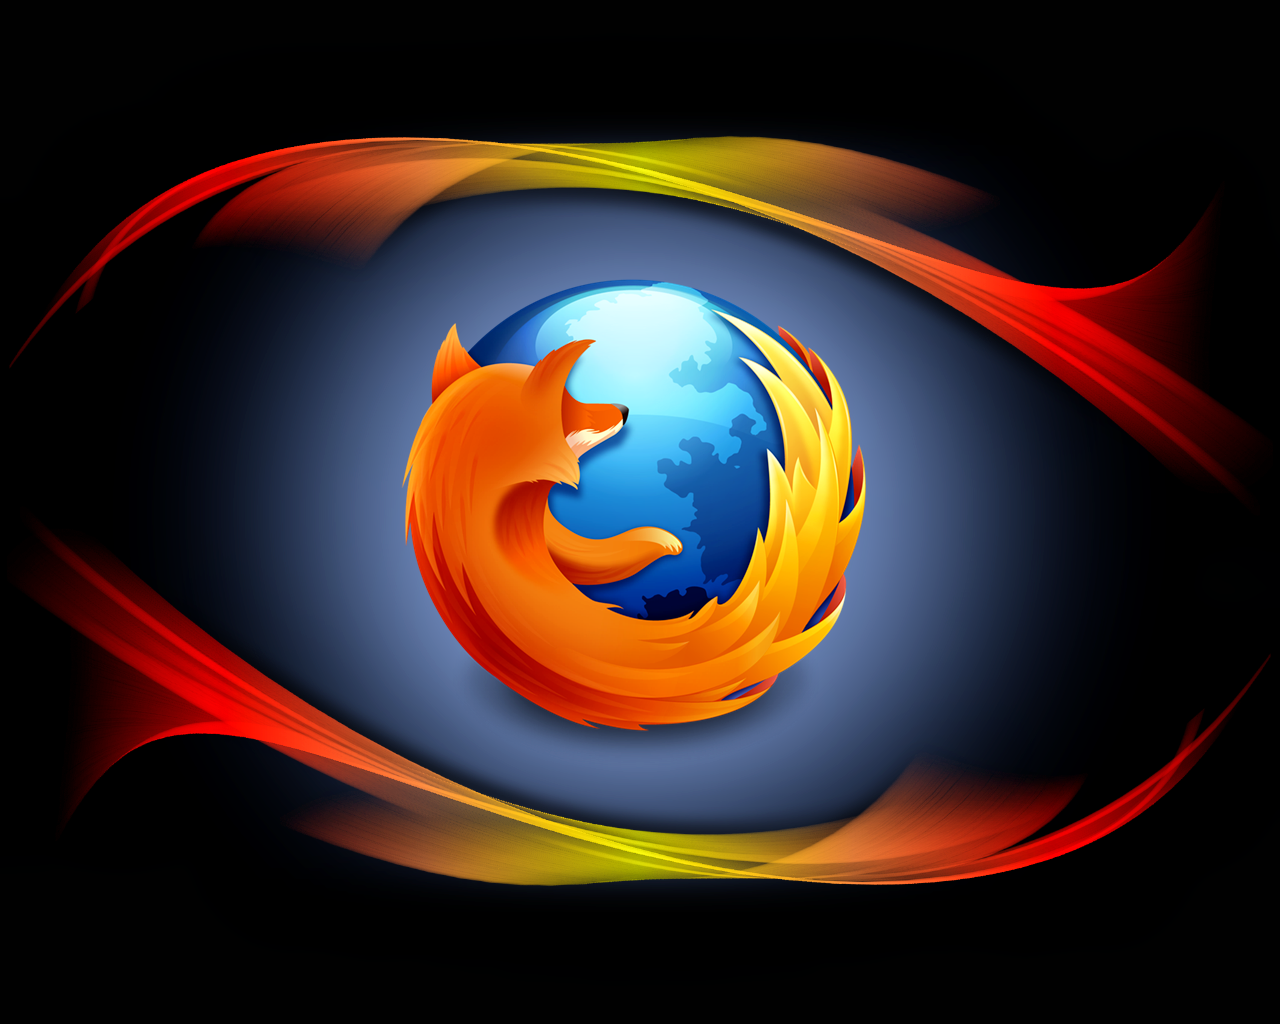 http://1.bp.blogspot.com/-_daWFLI0U2Q/UamKrO-ZsYI/AAAAAAAAAHg/VWz70NmWWAo/s1600/Free-Mozilla-Firefox-Wallpaper.png